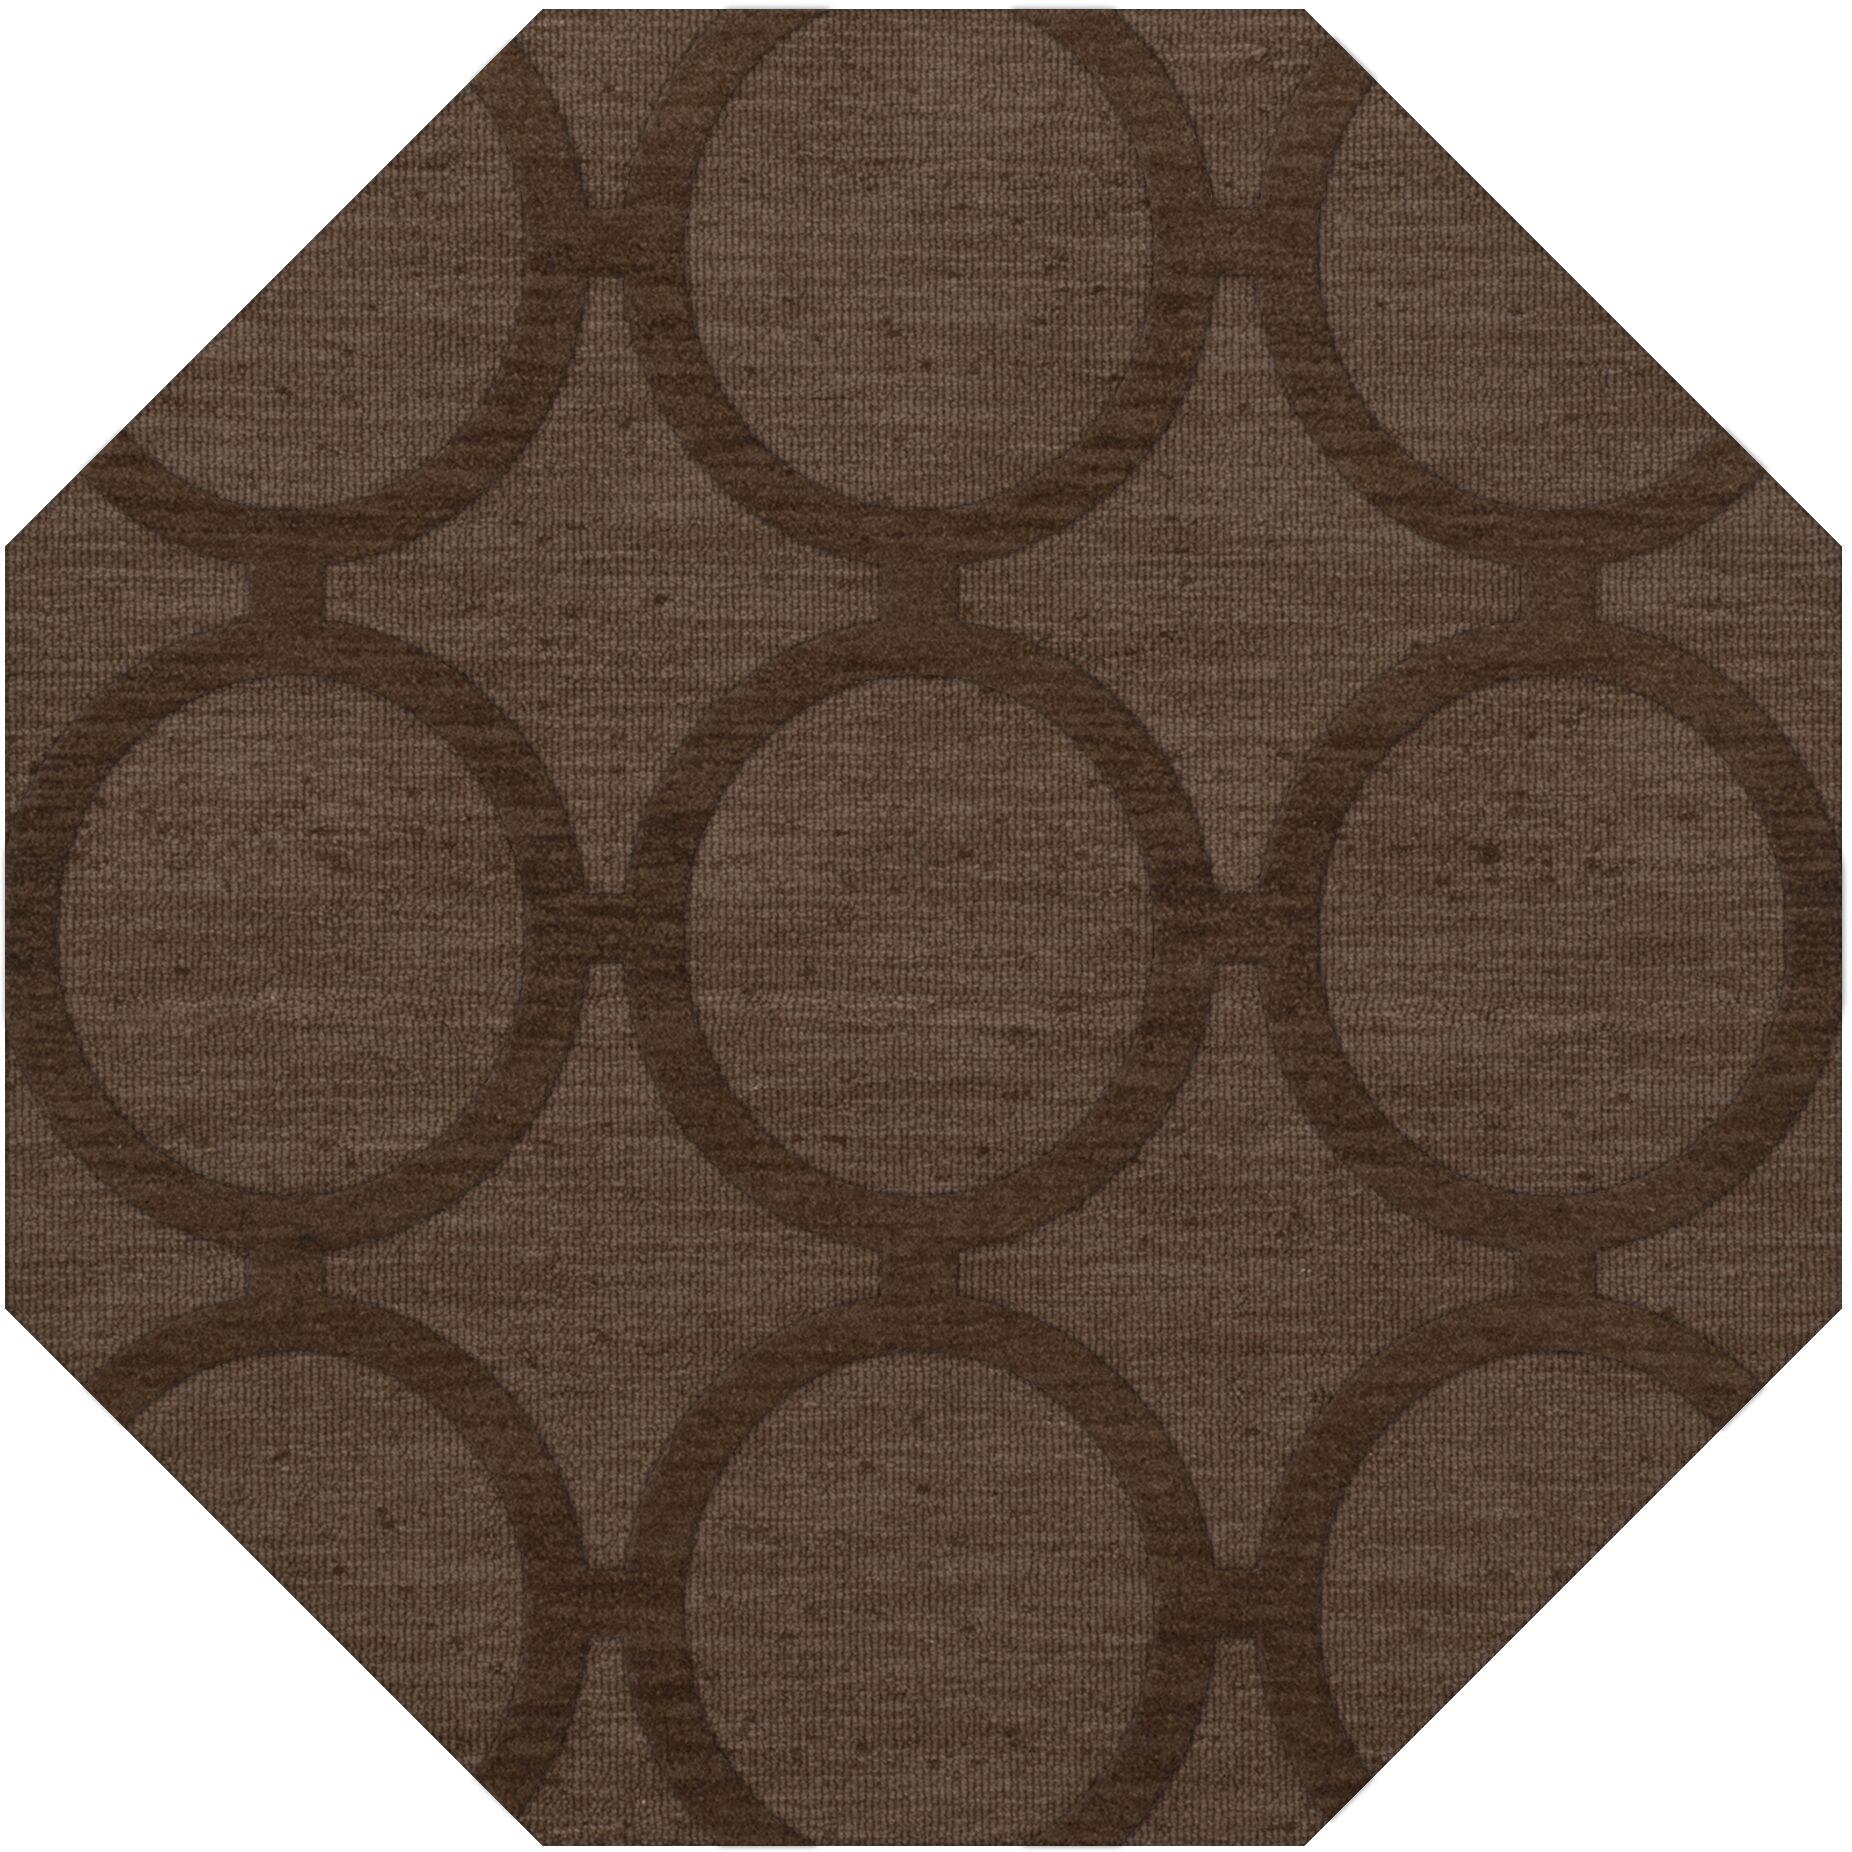 Dover Tufted Wool Mocha Area Rug Rug Size: Octagon 8'